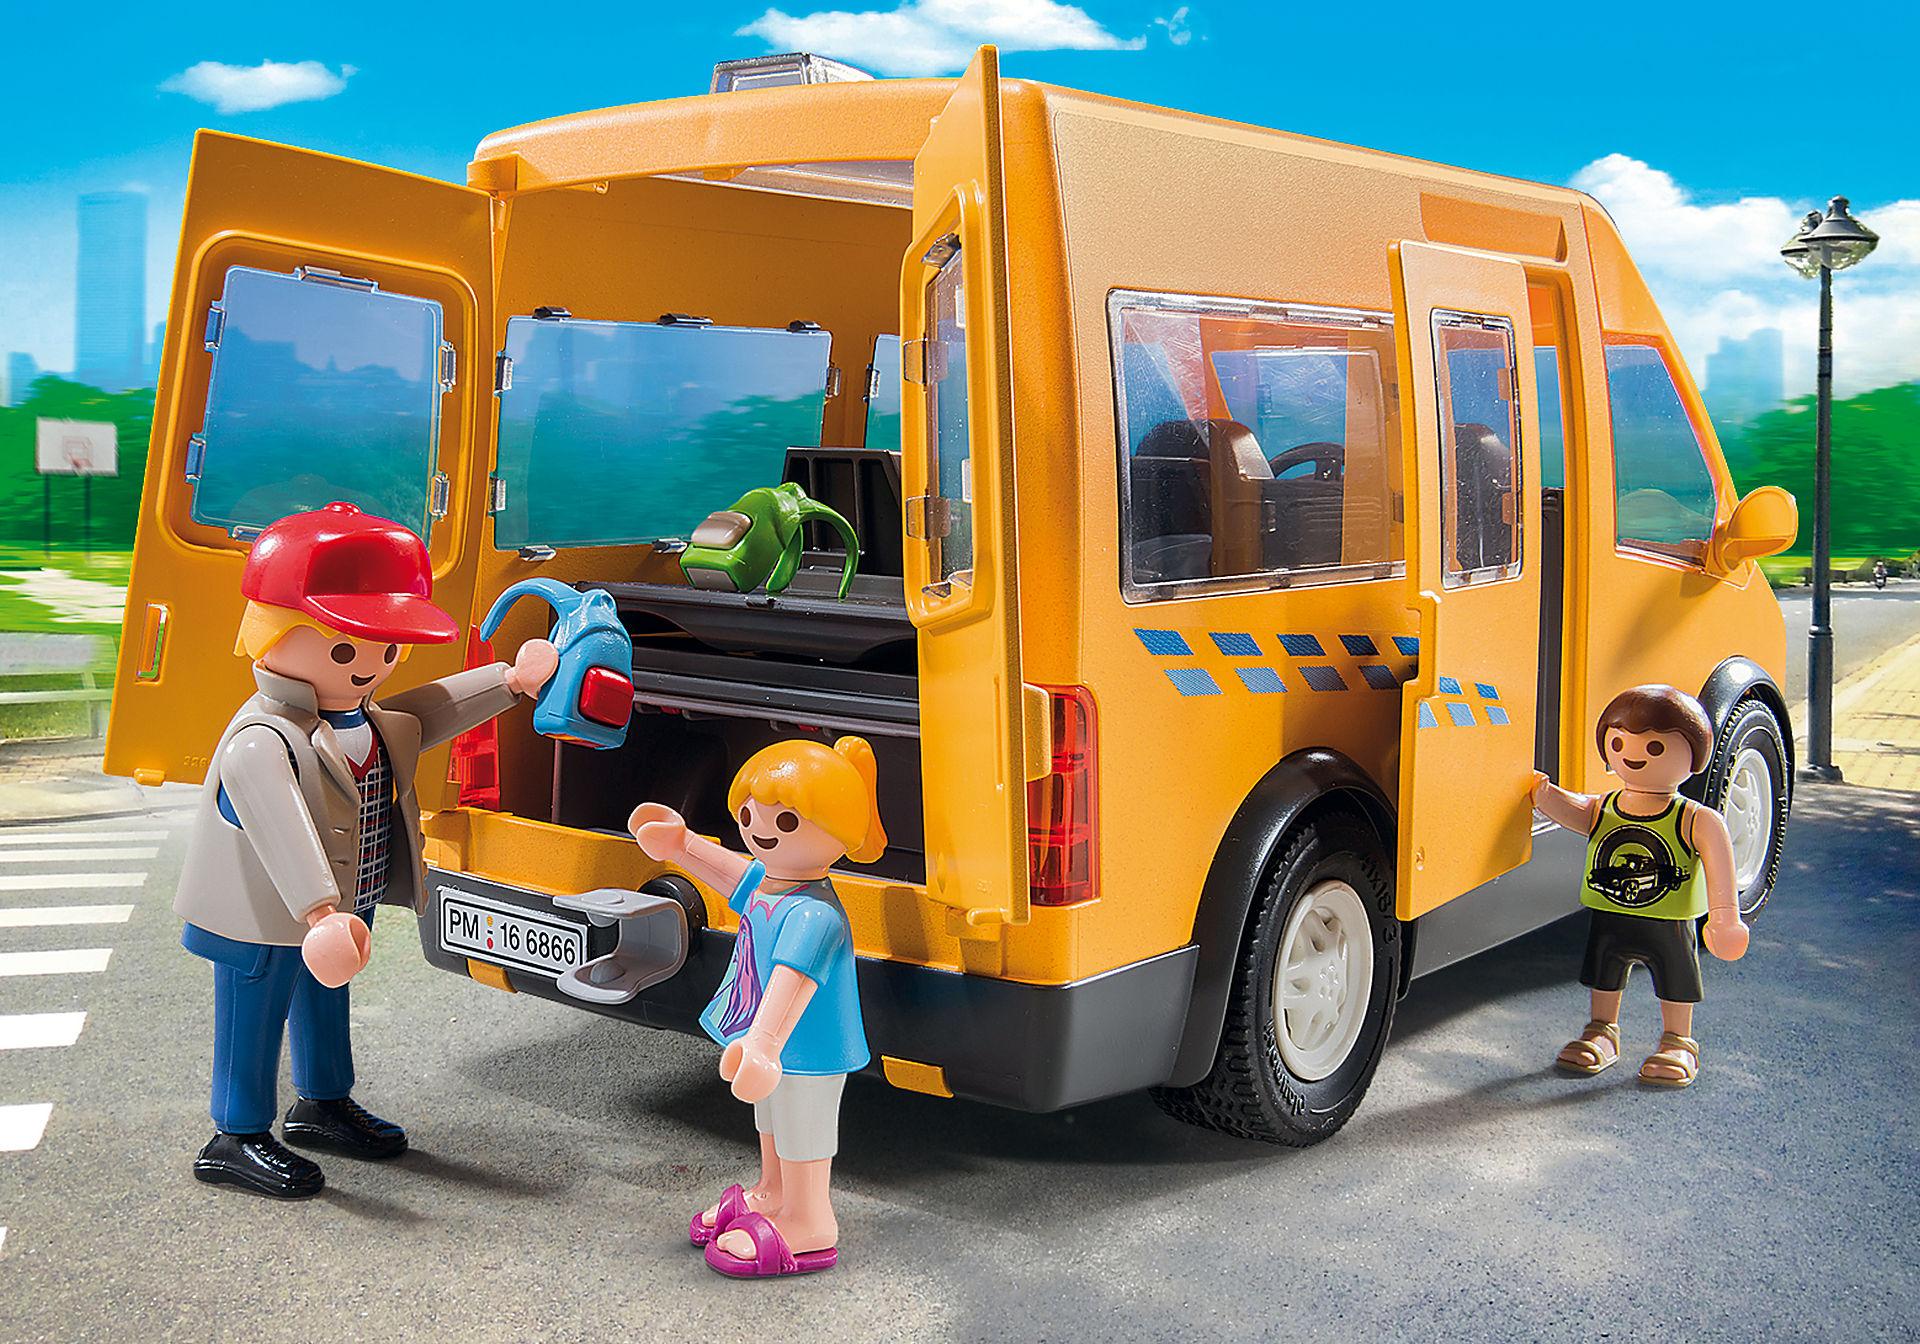 http://media.playmobil.com/i/playmobil/6866_product_extra1/Schoolbusje